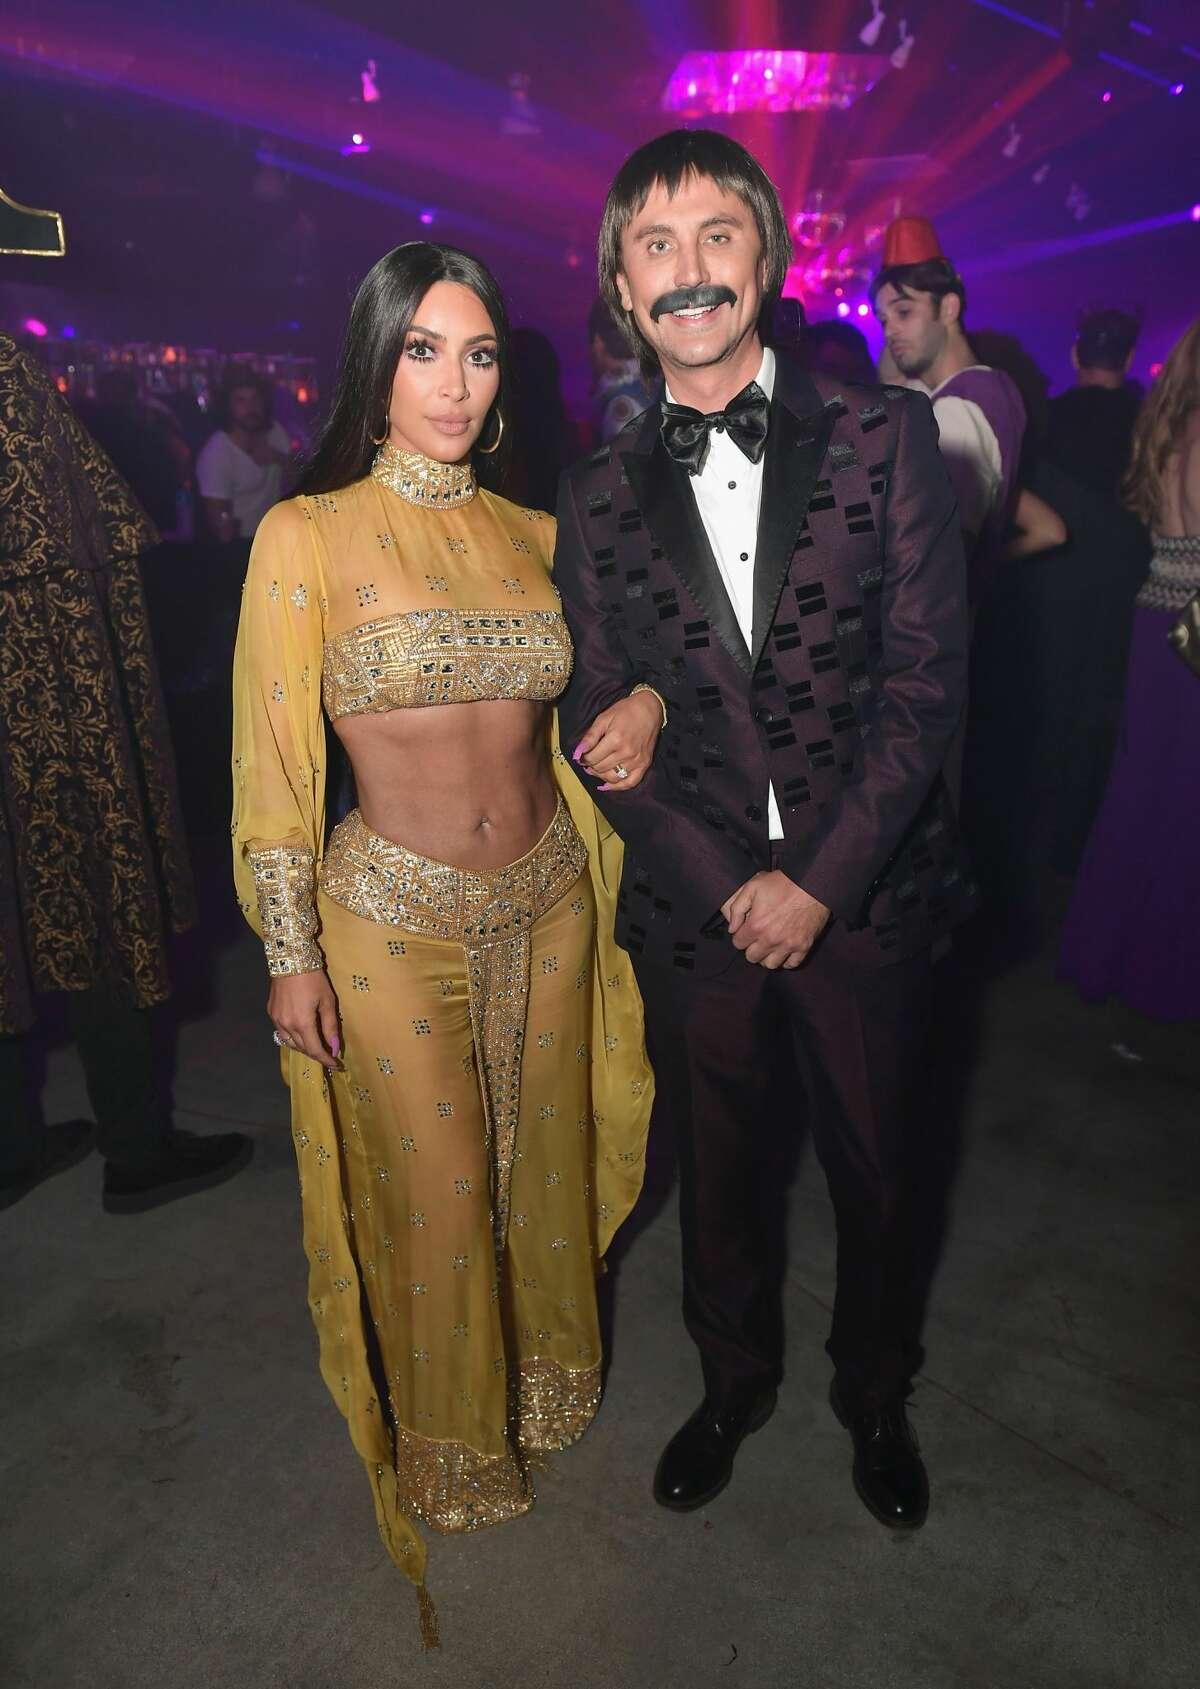 Kim Kardashian (L) and Jonathan Cheban attend Casamigos Halloween Party on October 27, 2017 in Los Angeles, California.